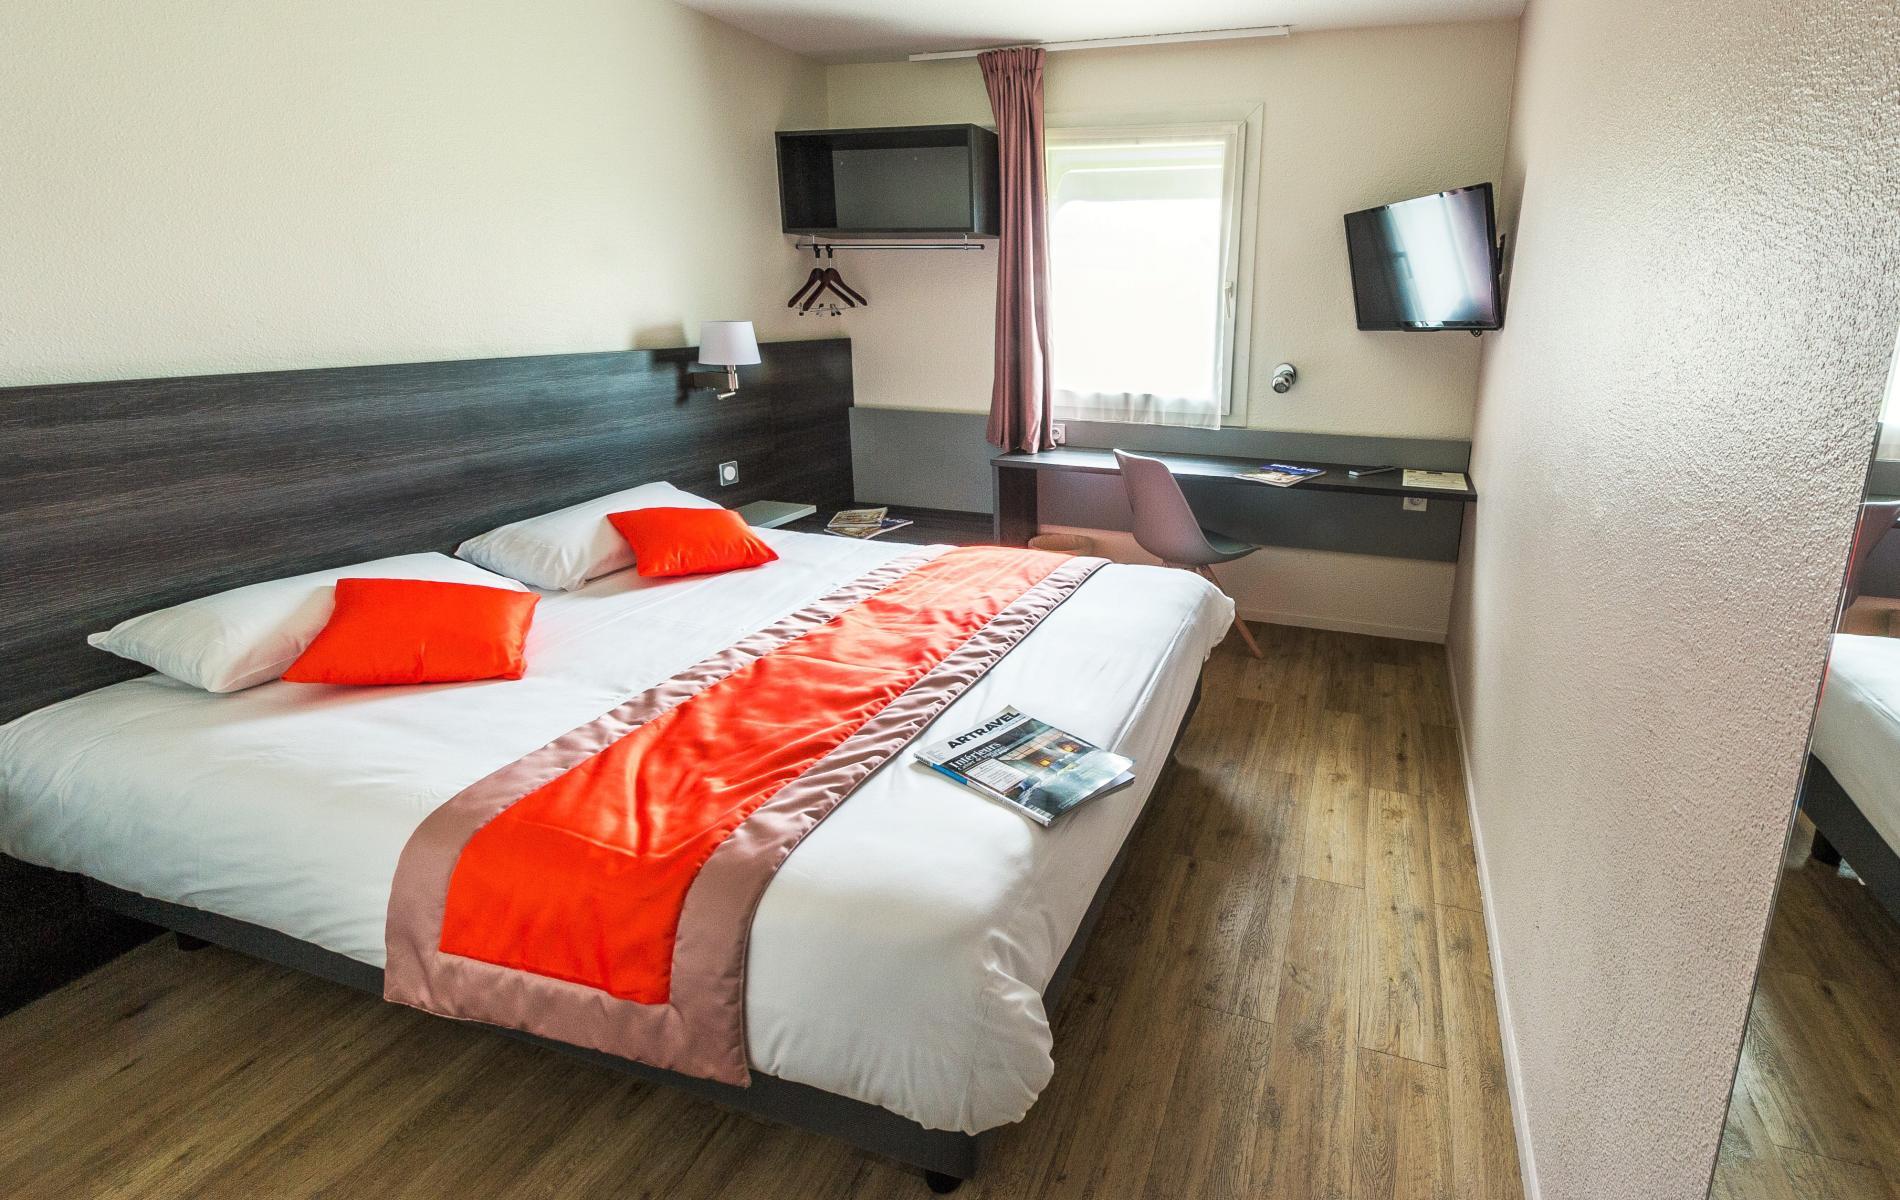 Chambres familiales l h tel carline beaune proches hospices de beaune for Tarif chambre double hopital